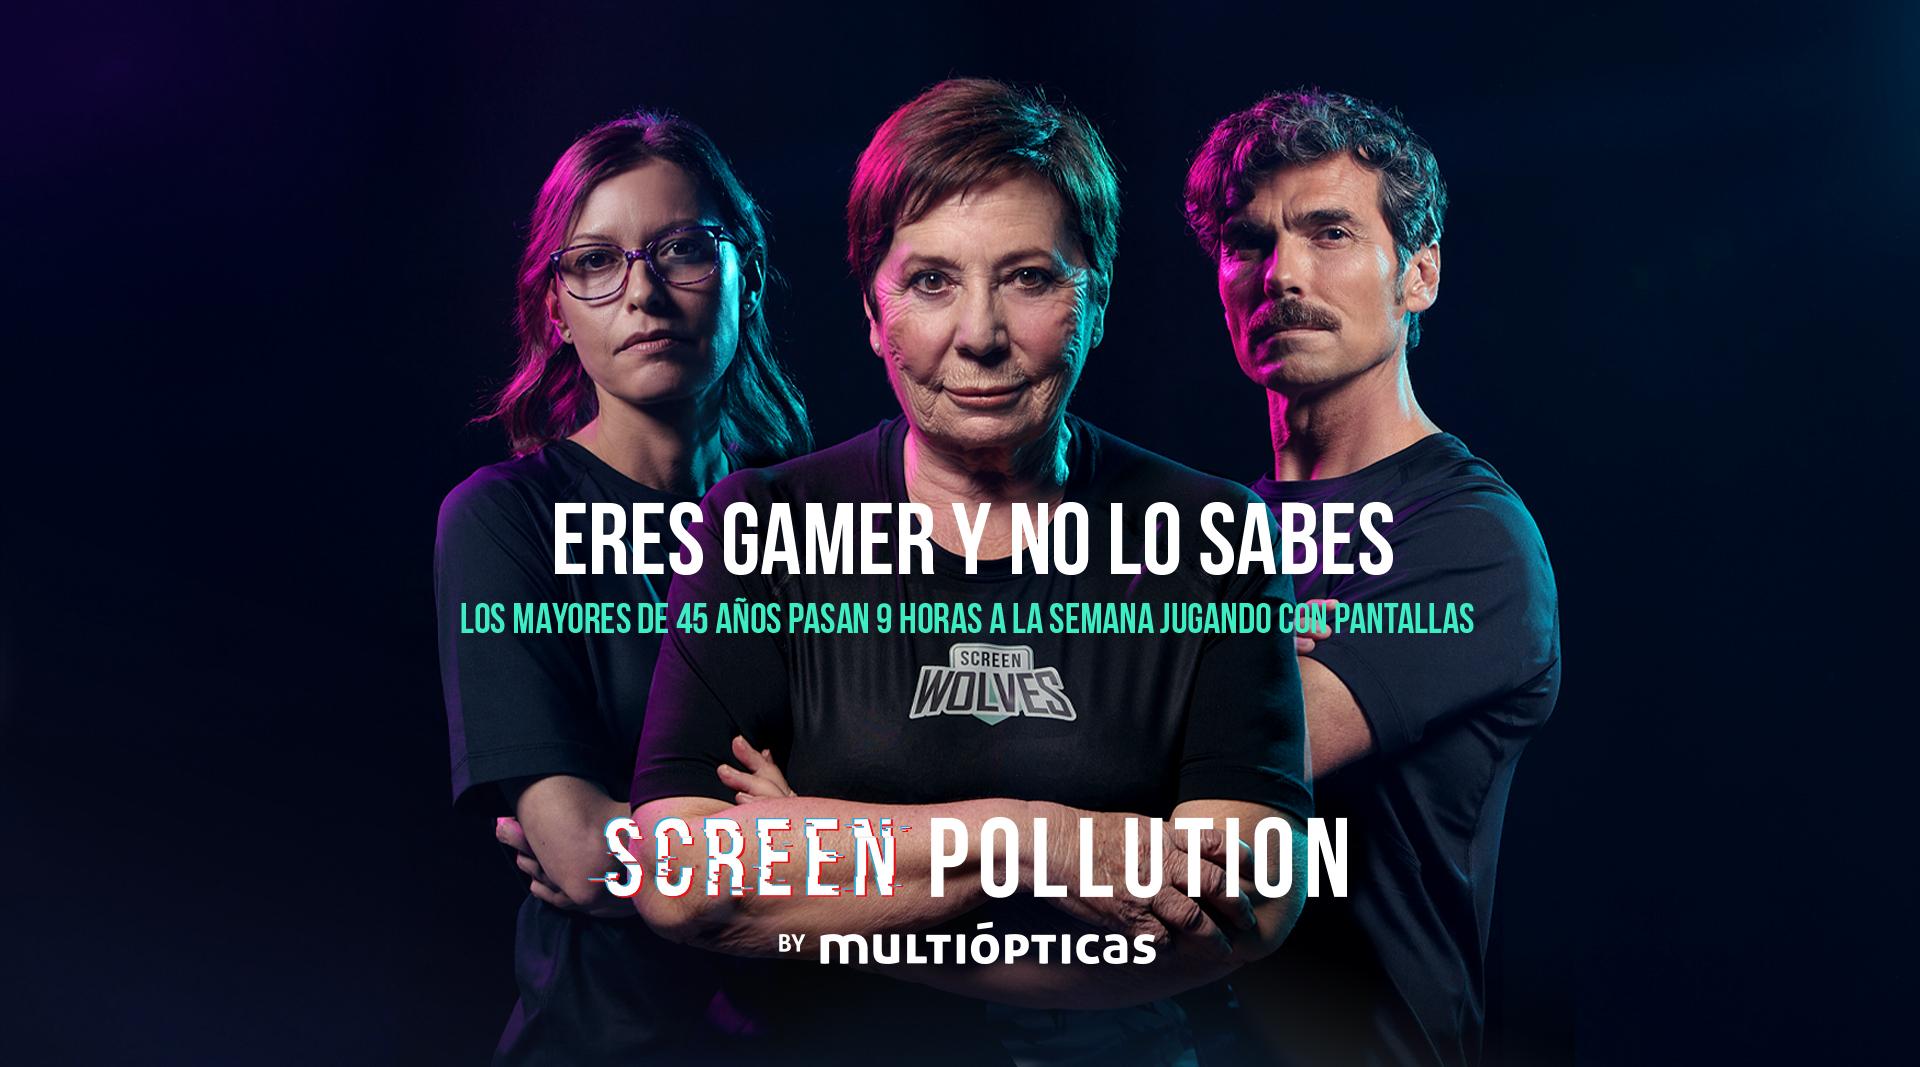 creen pollution